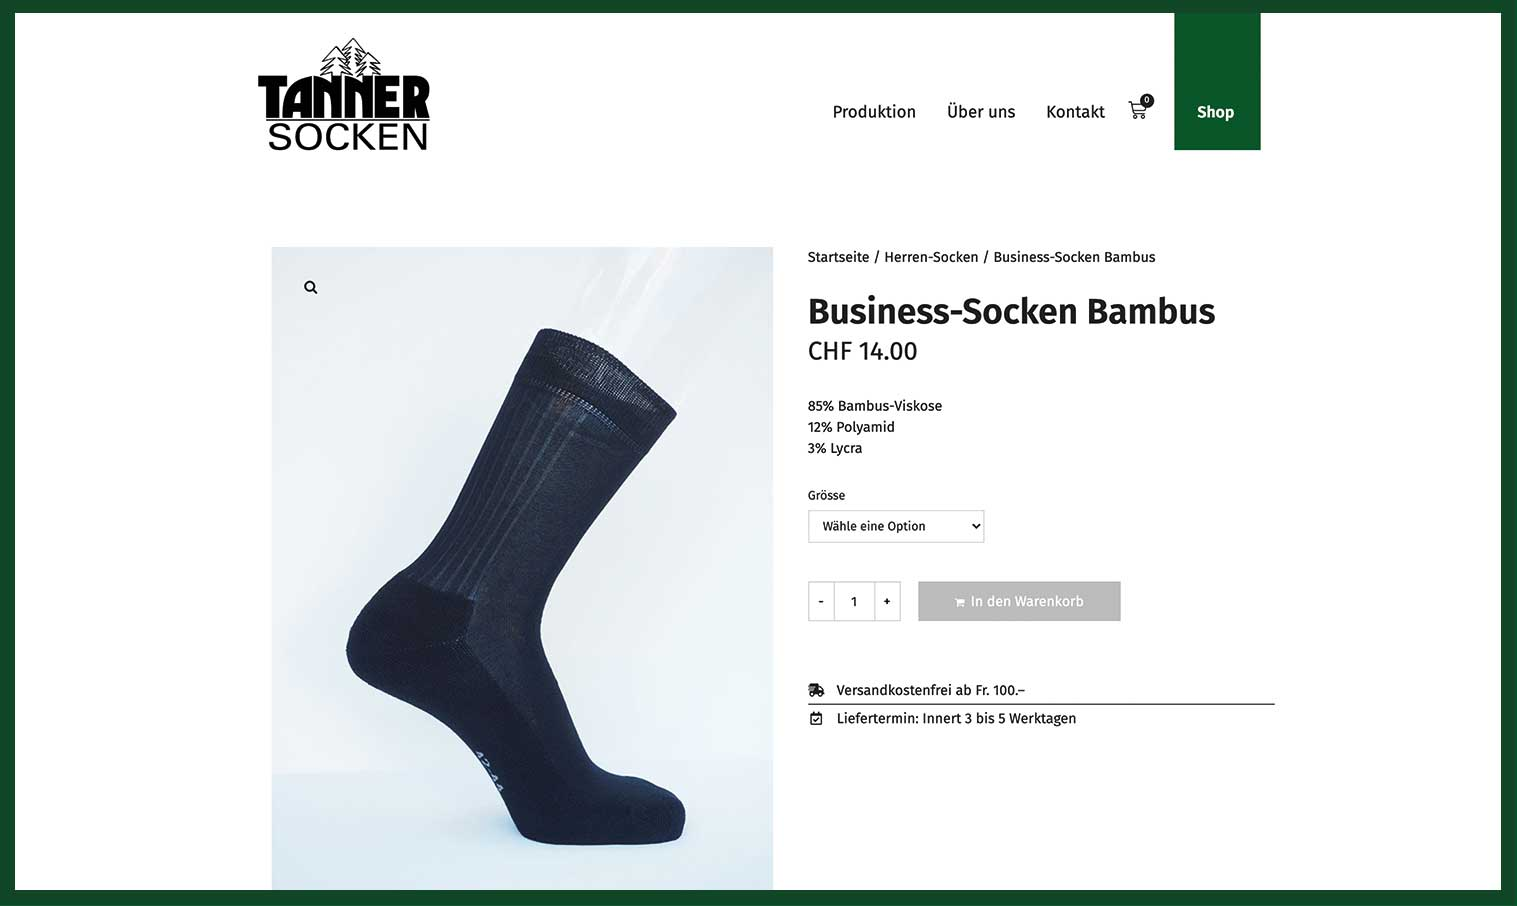 Tannersocken Webshop